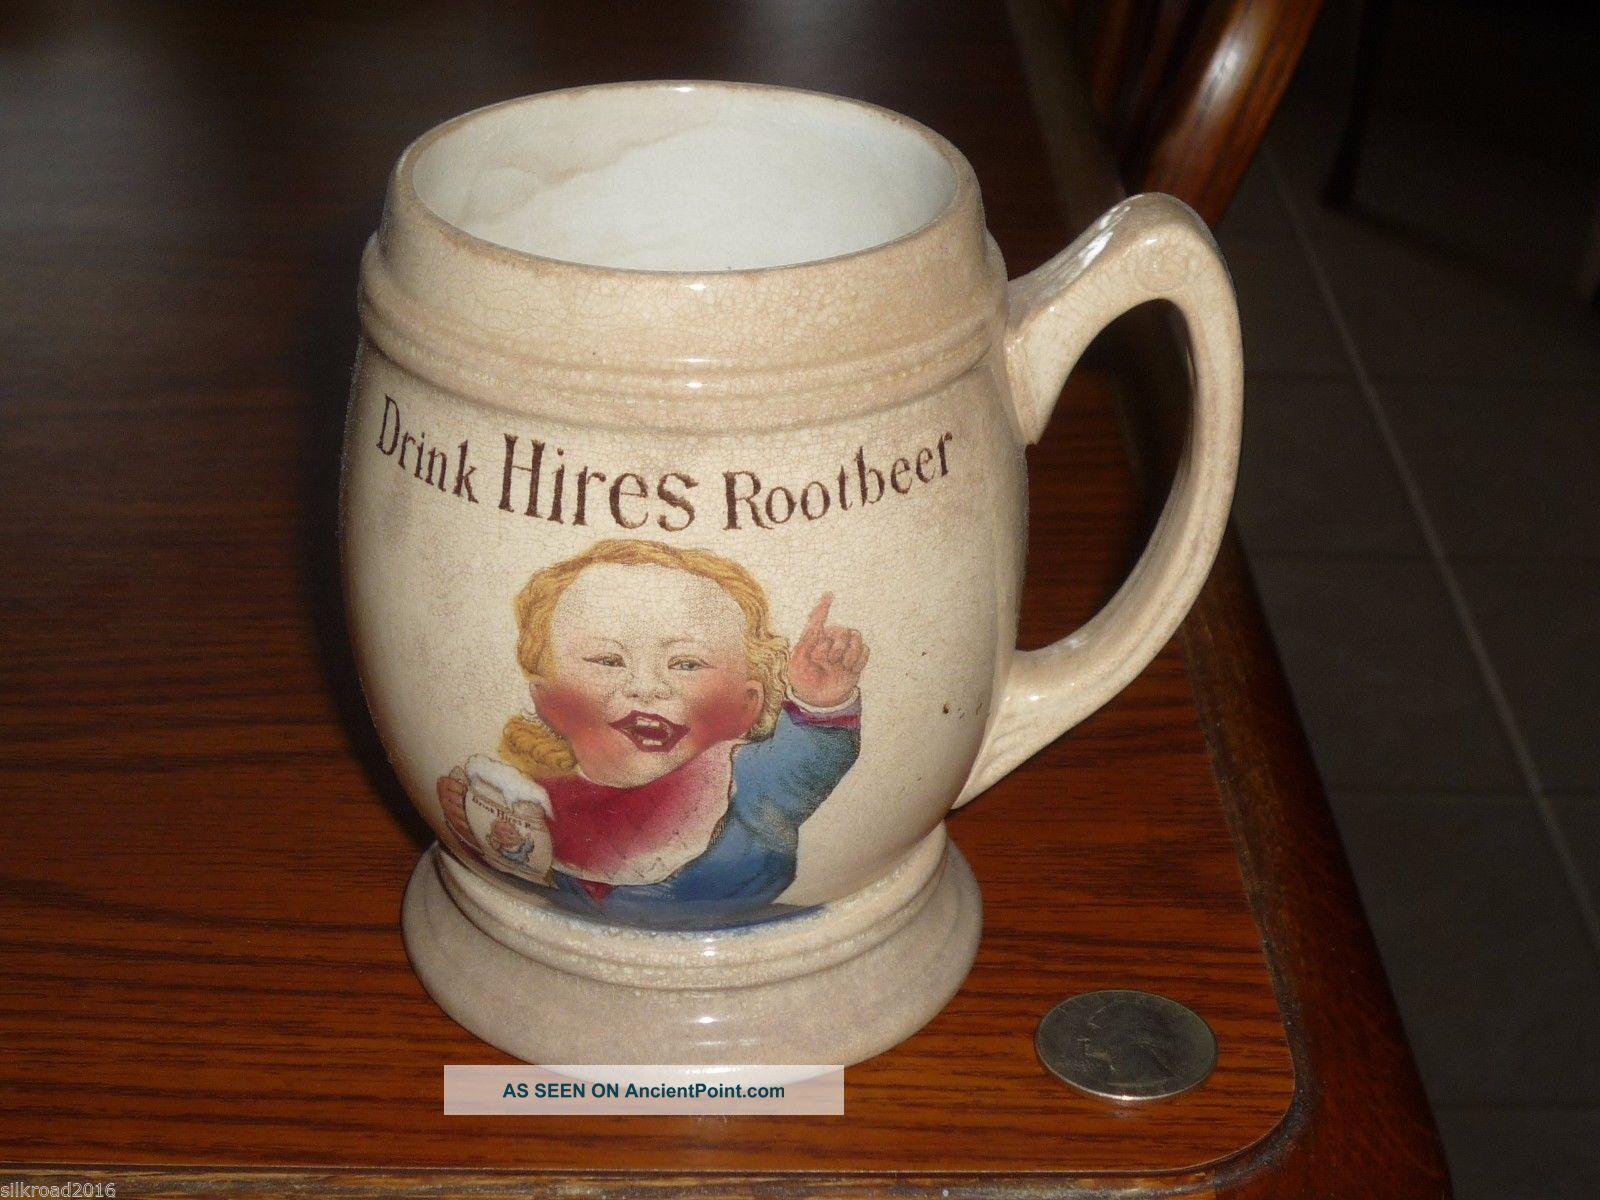 Vge 1907 Villeroy & Boch Color Litho: Drink Hires Root Beer American Adv.  Mug Mugs & Tankards photo